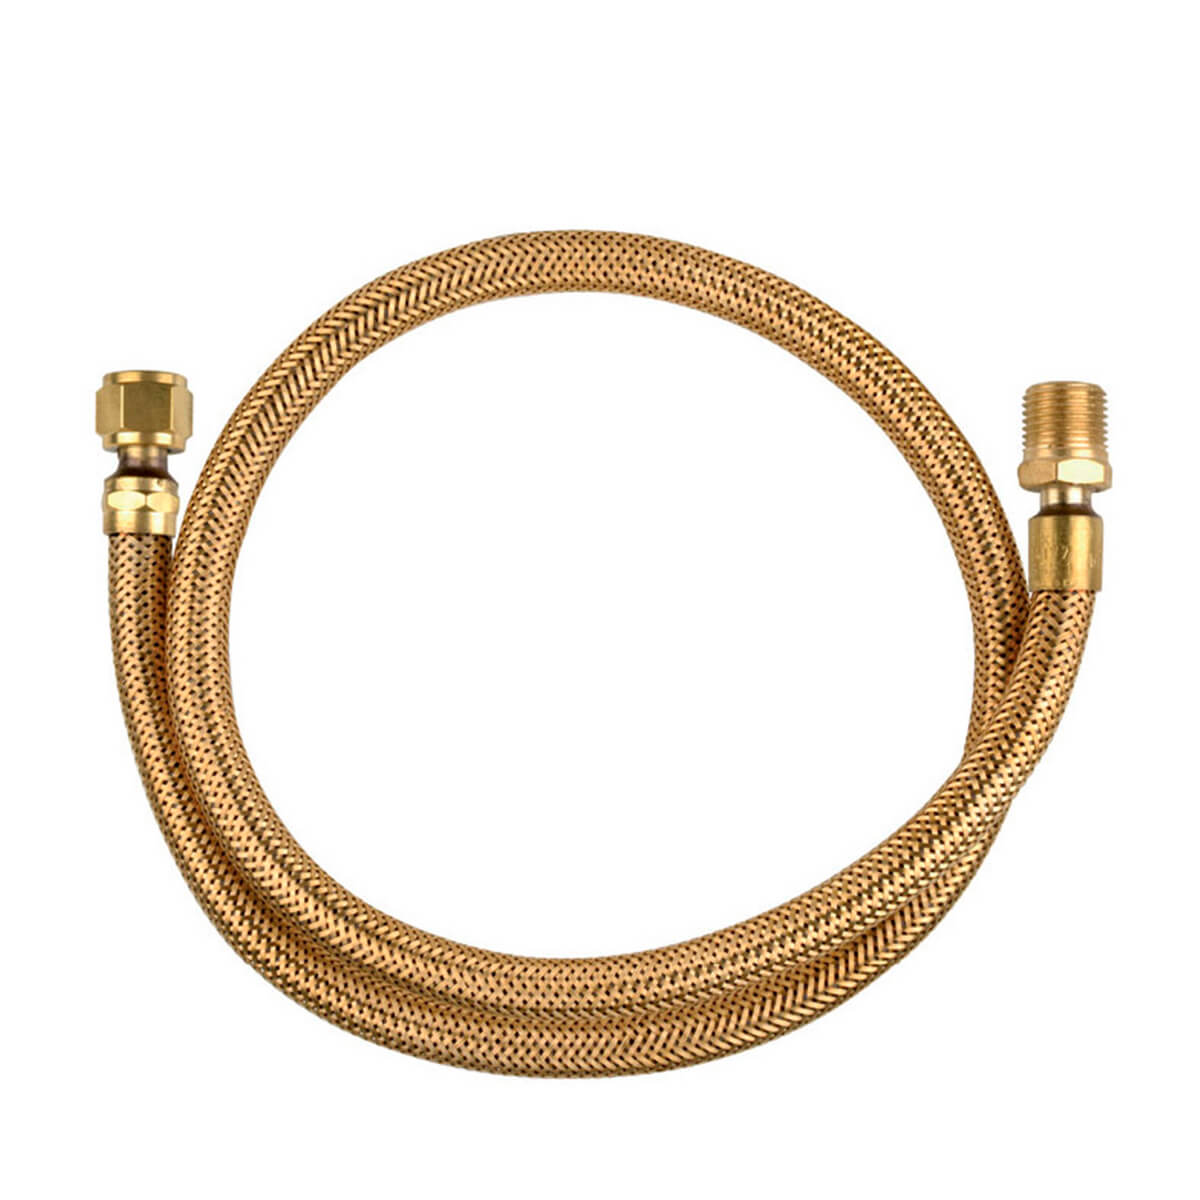 Ligação Flex Tombak 1,20M GLP/GN Diam. 3/8 1/2 BSP (IXE) Jackwal - 15829/1360